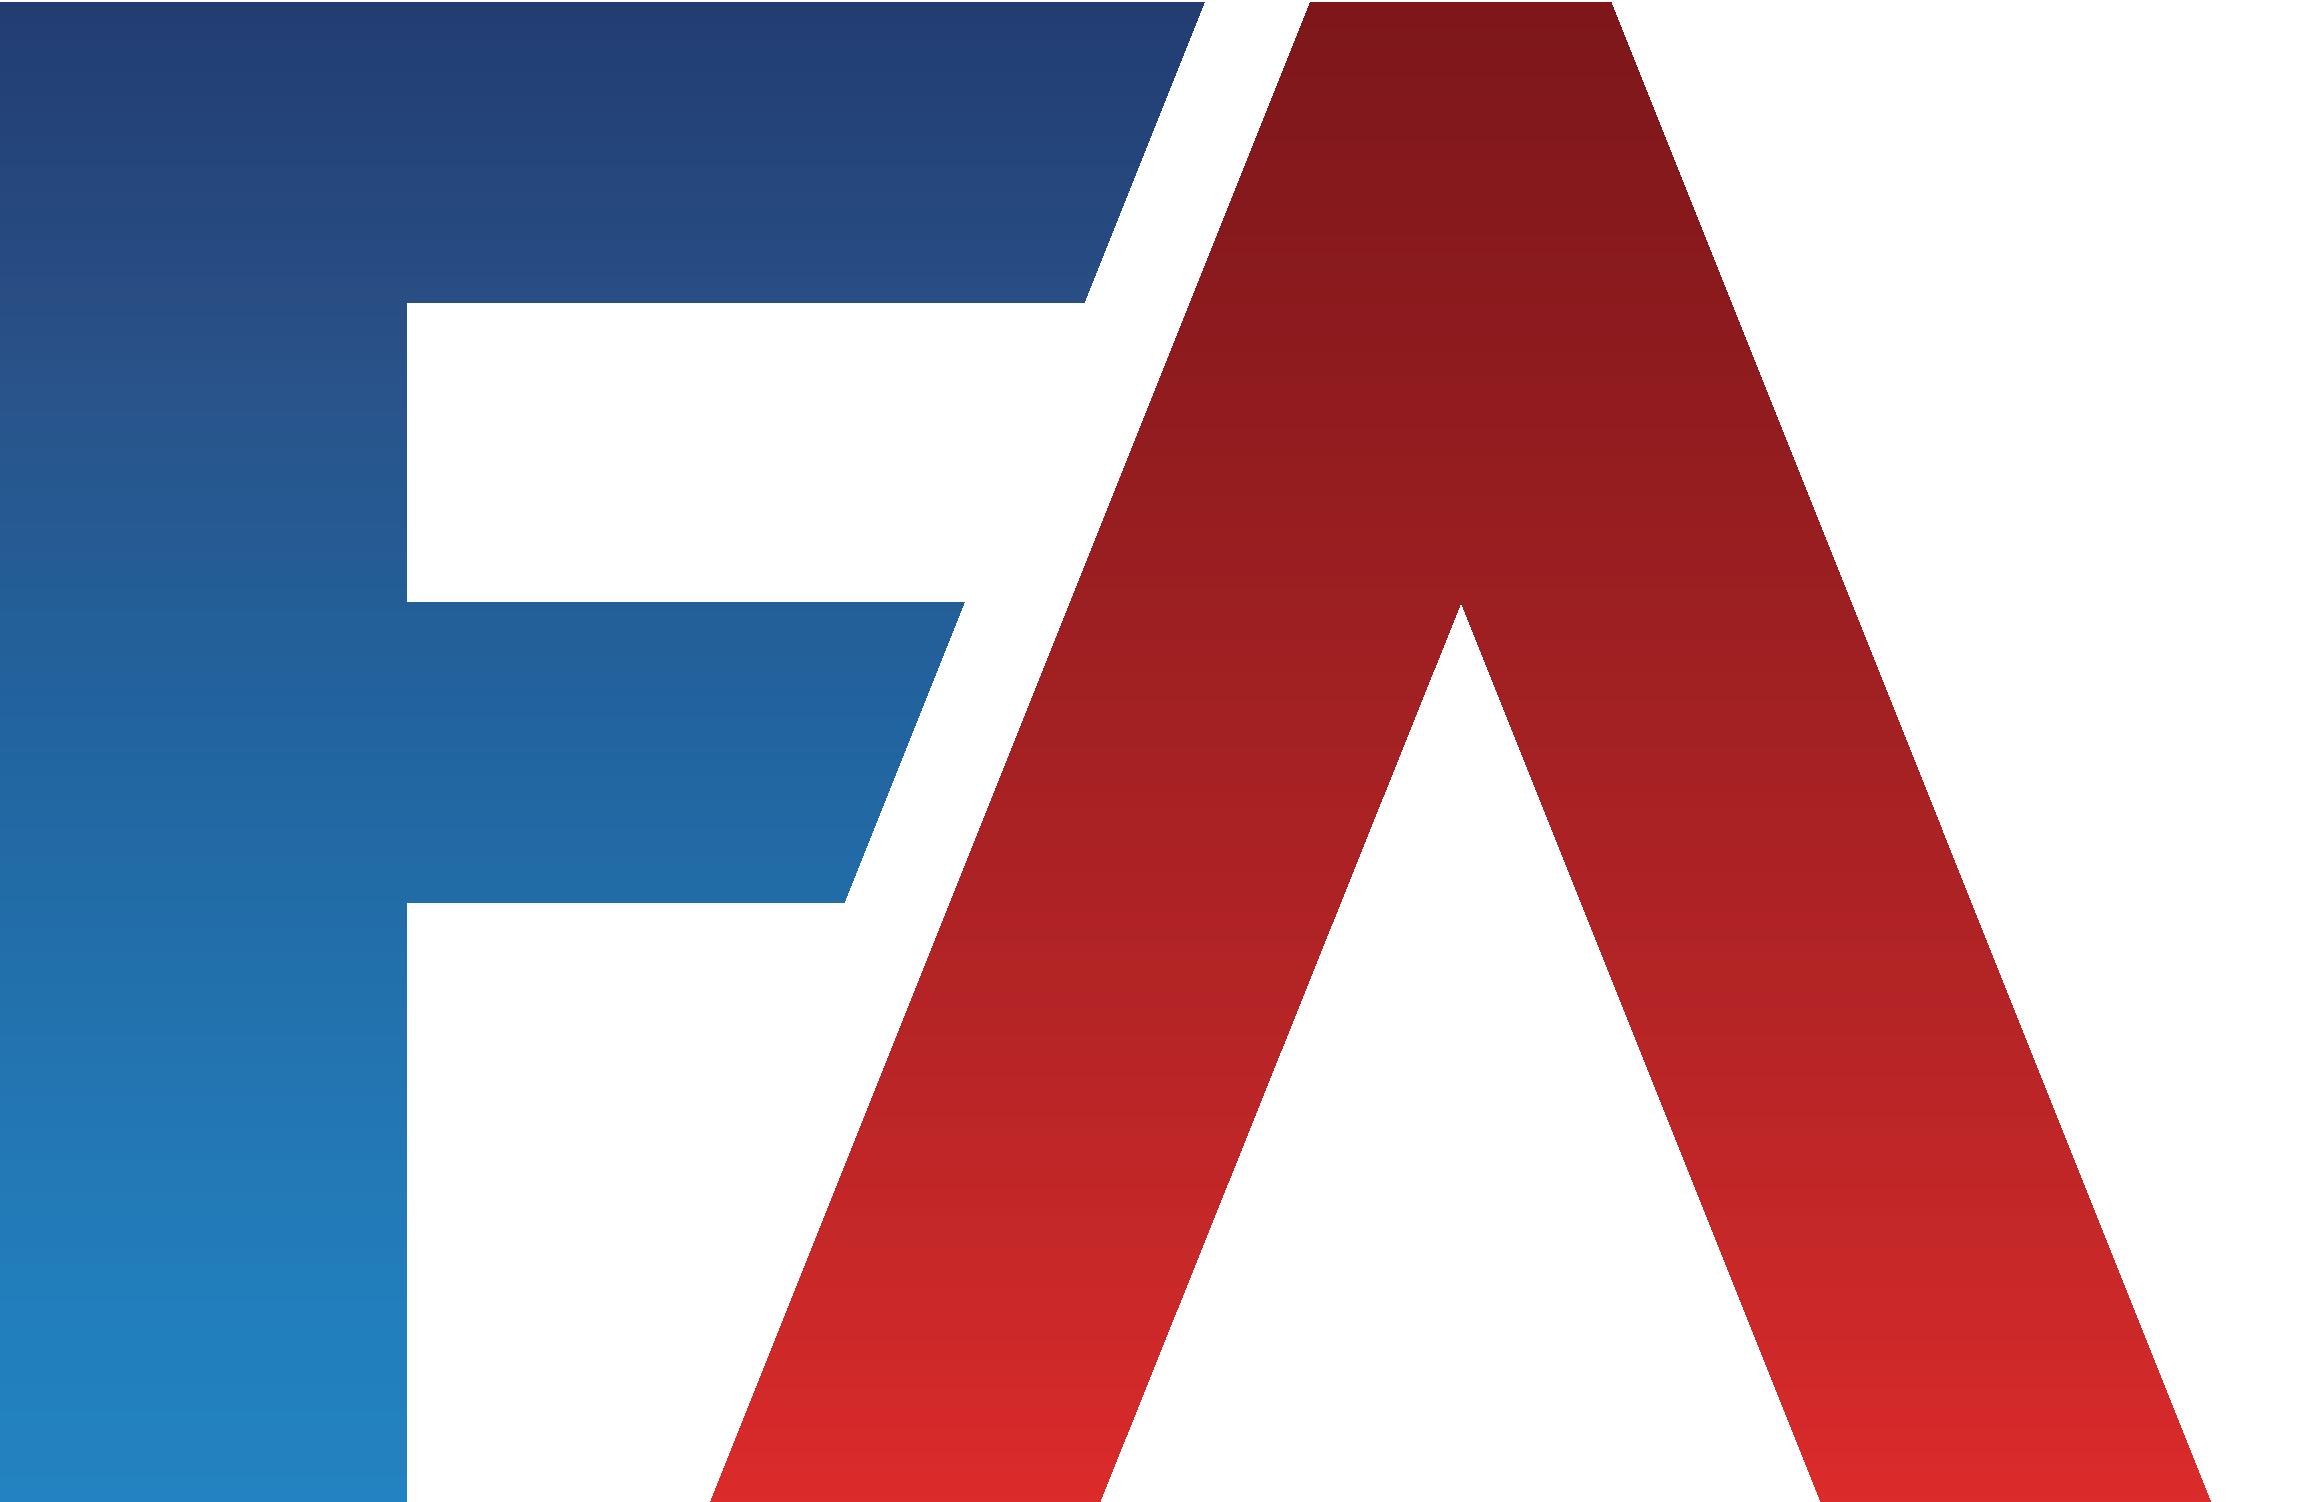 NFL Game Matchup Report - Week 1 | FantasyAlarm com